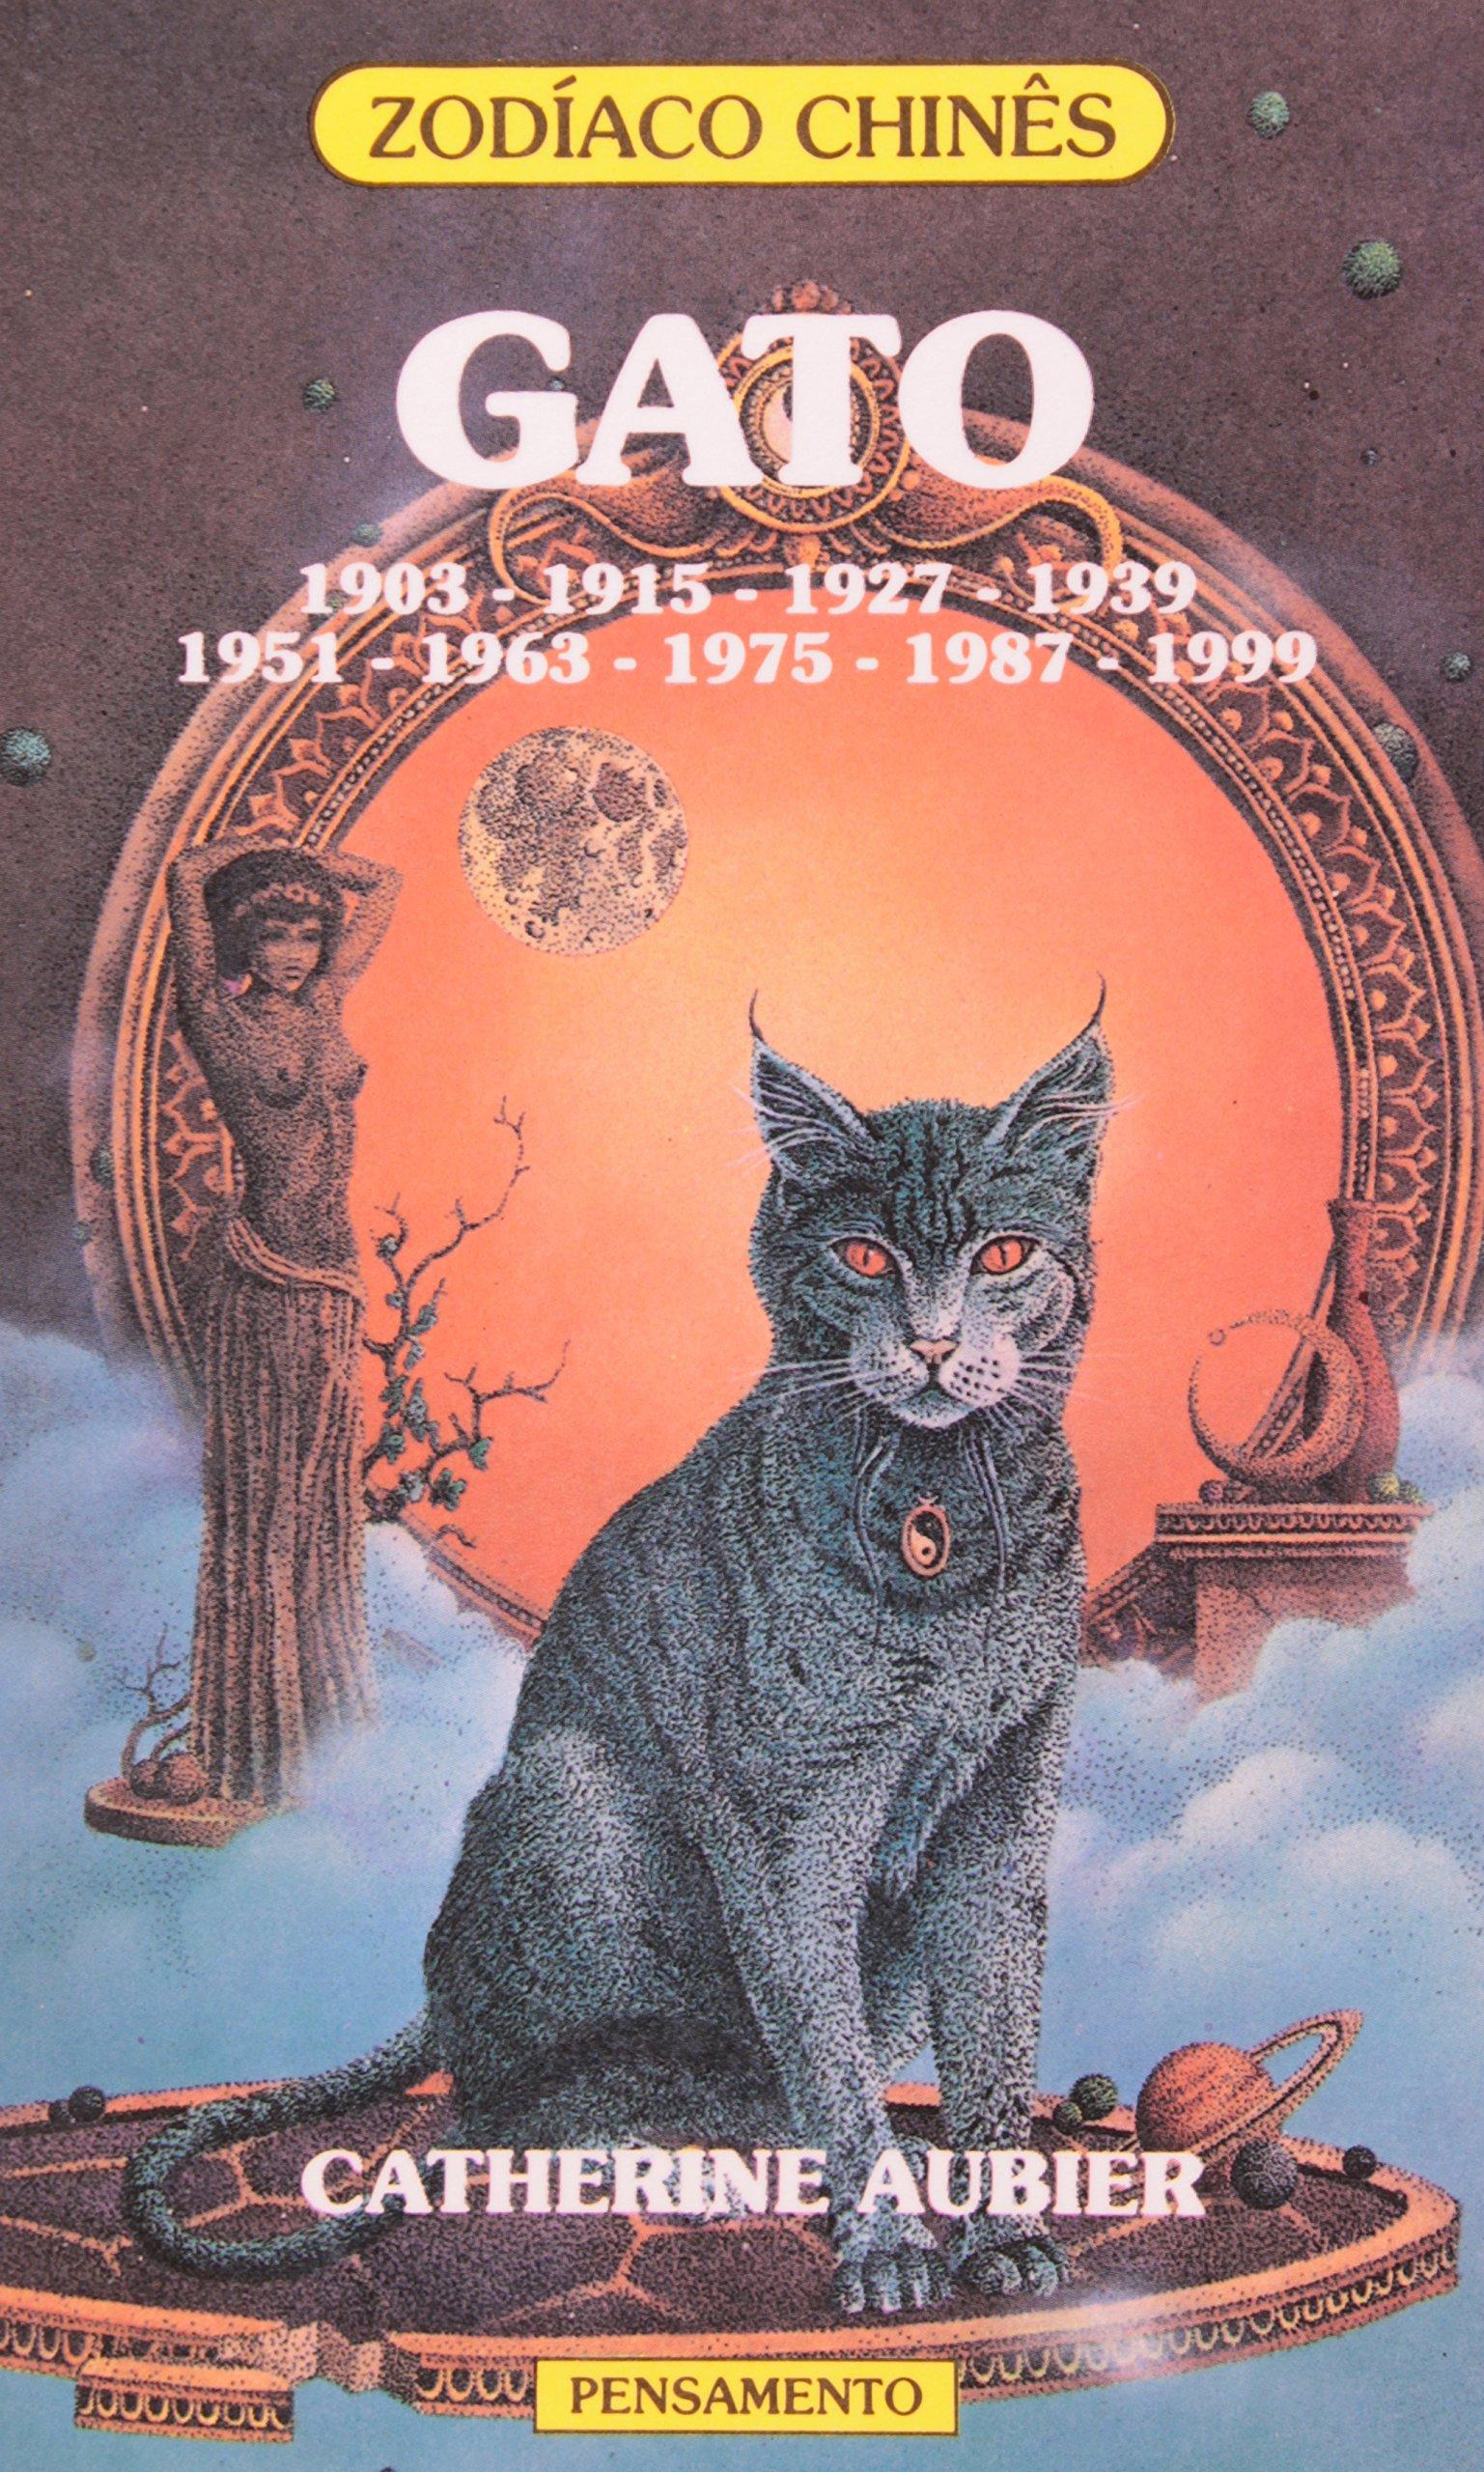 Zodiaco Chines Gato (Em Portuguese do Brasil) (Portuguese Brazilian) Paperback – 1991